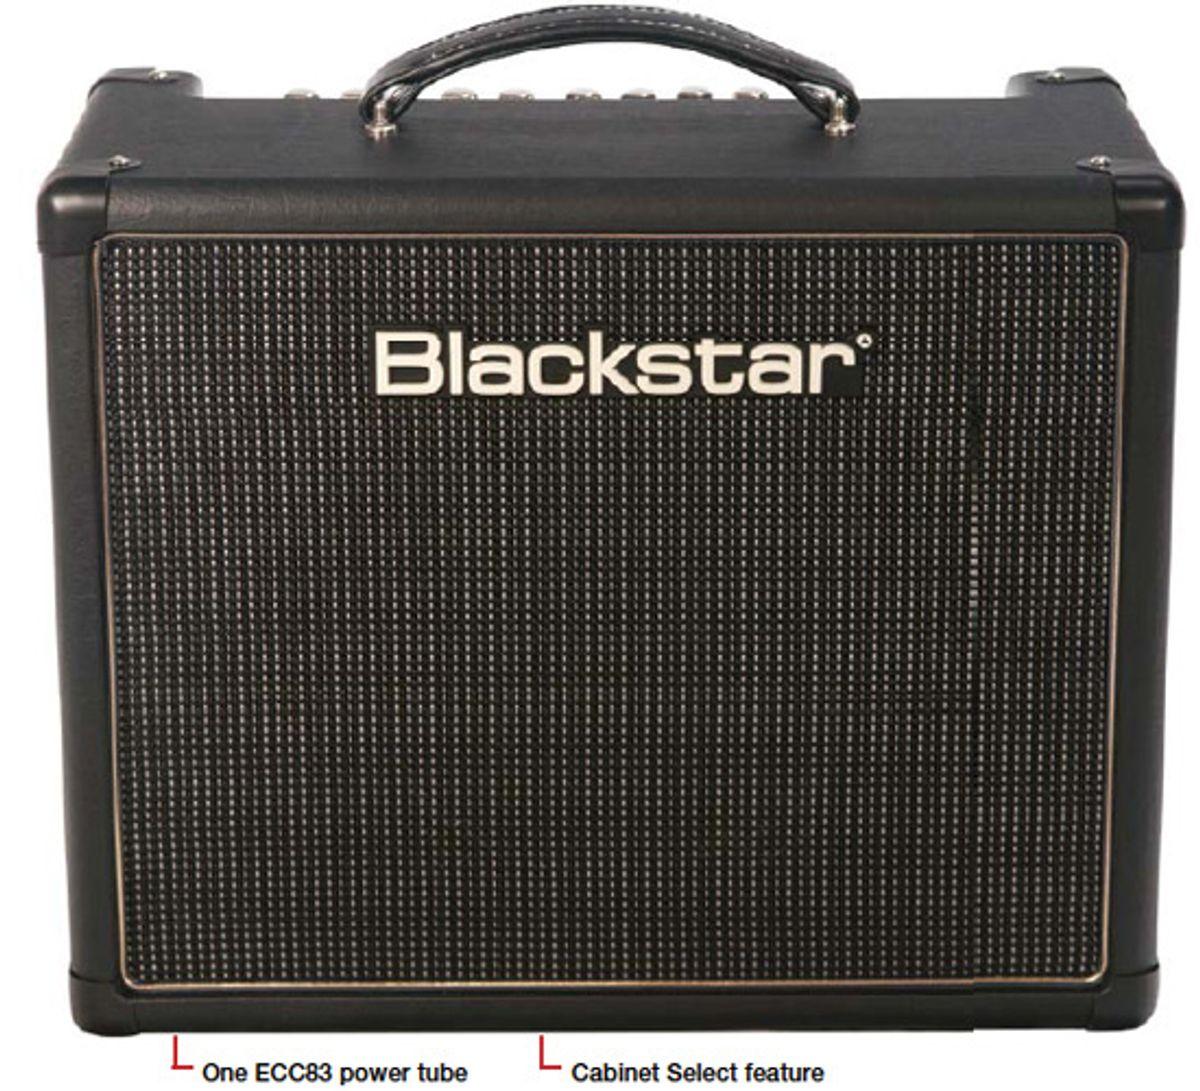 Blackstar HT-5R Amp Review